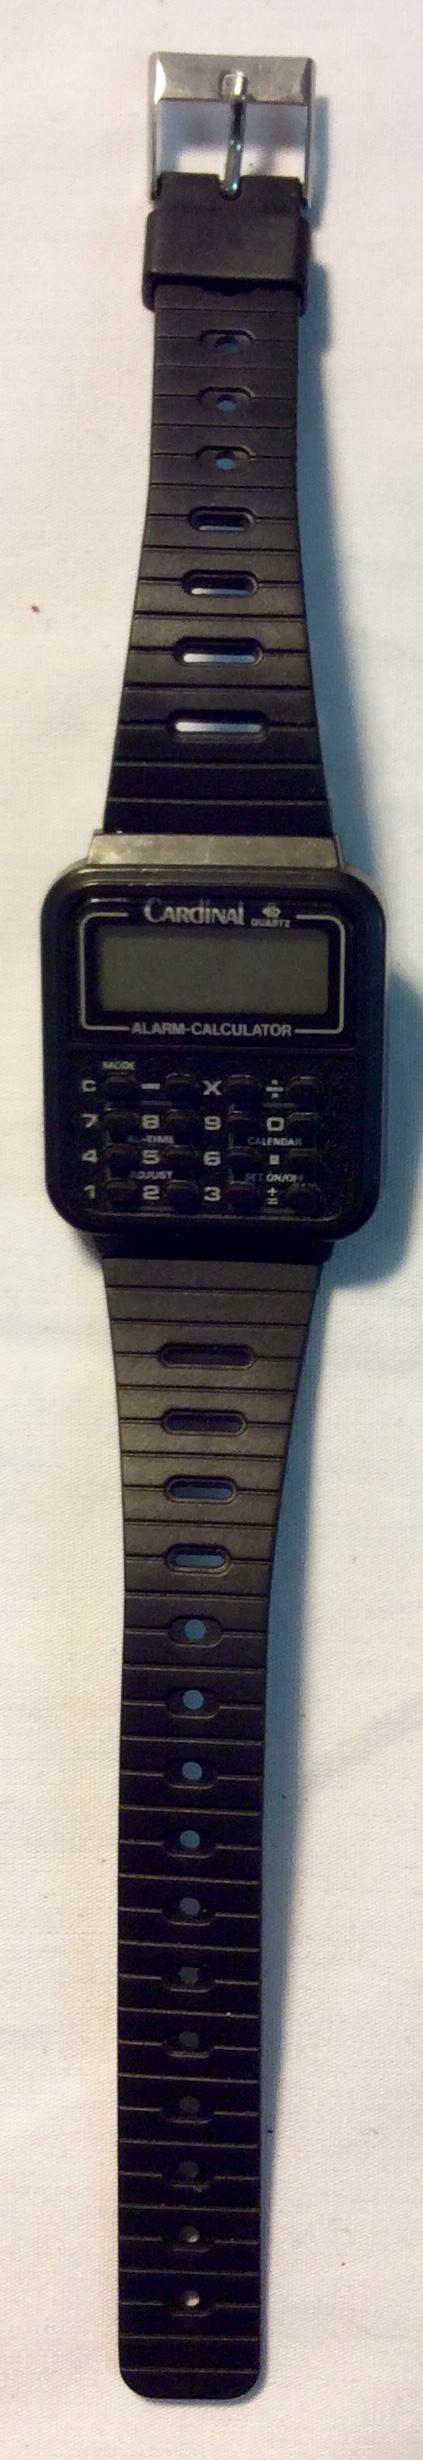 Cardinal Quartz Digital calculator